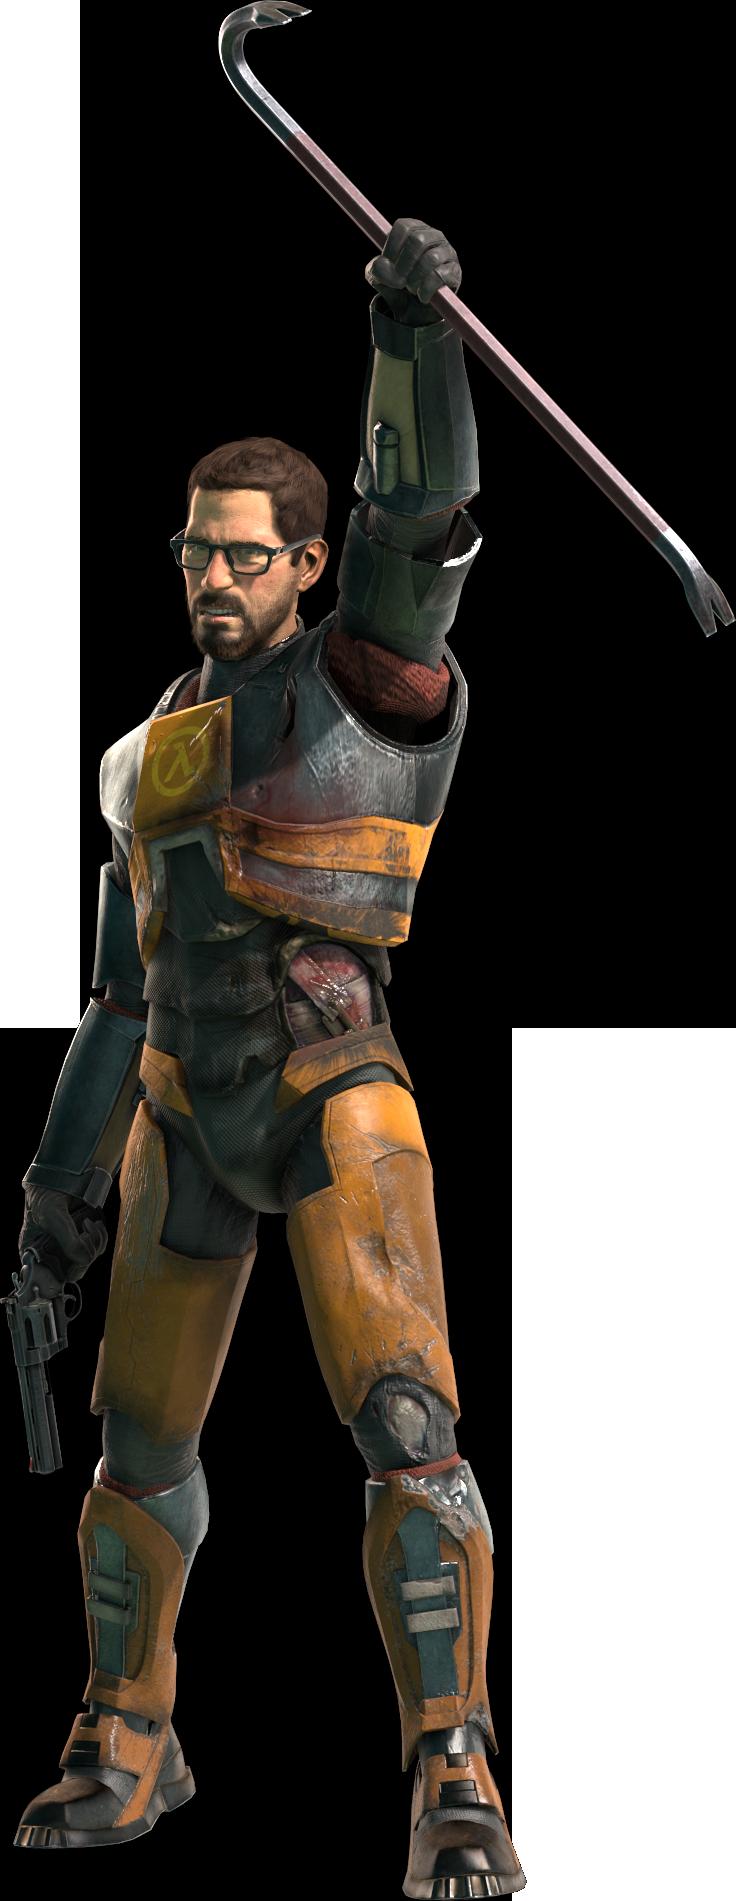 Gordon Freeman By Yare Yare Dong On Deviantart Gordon Freeman Half Life Half Life Game